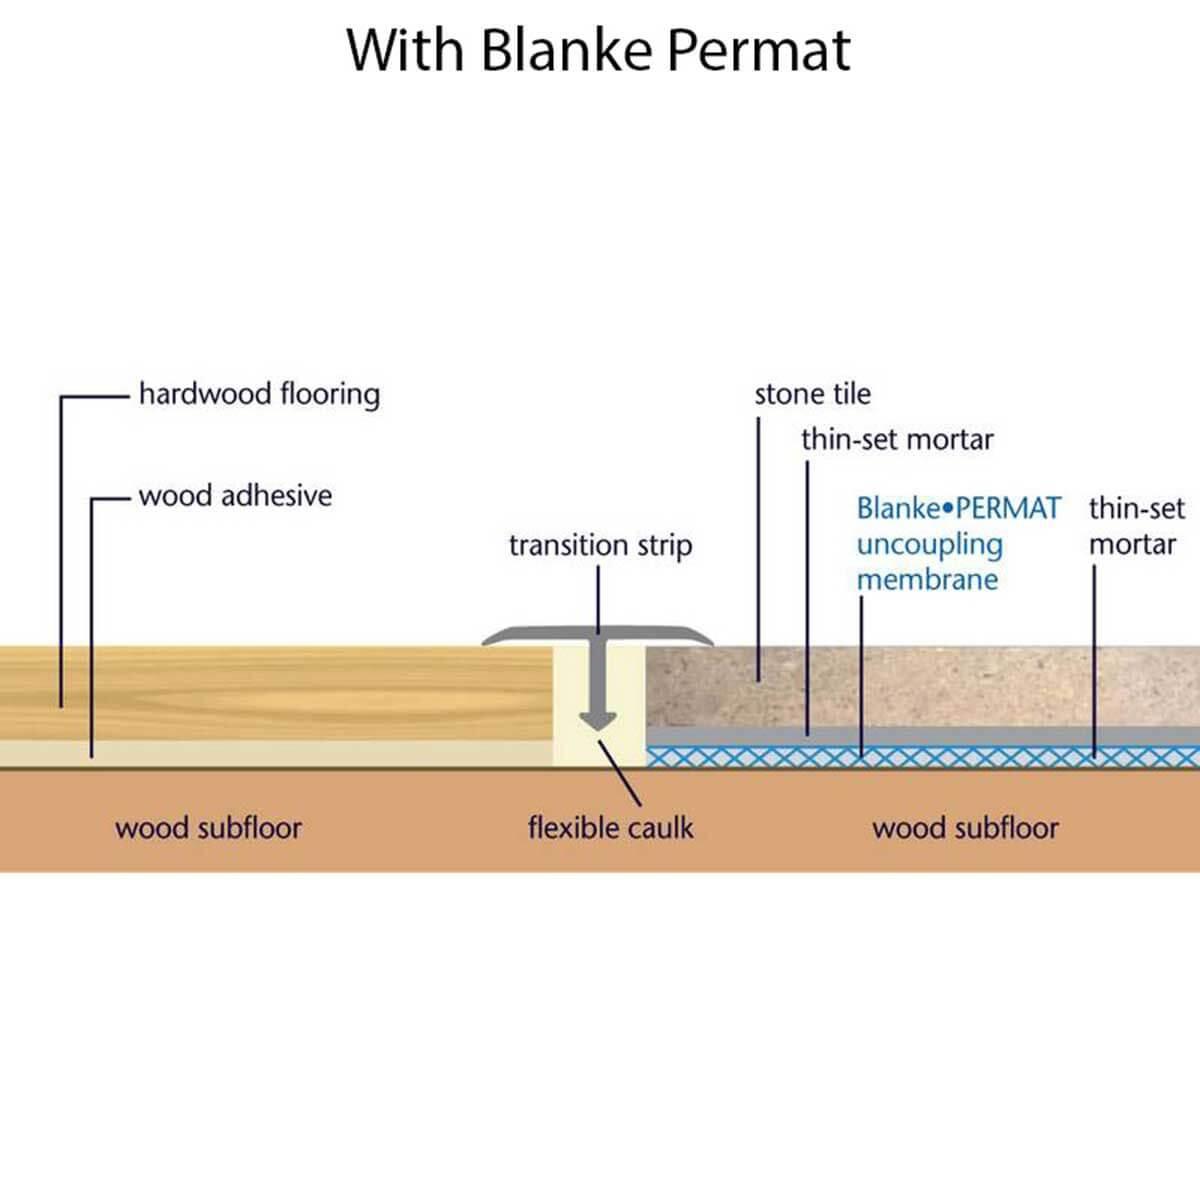 Blanke Perman Uncoupling Membrane Installed